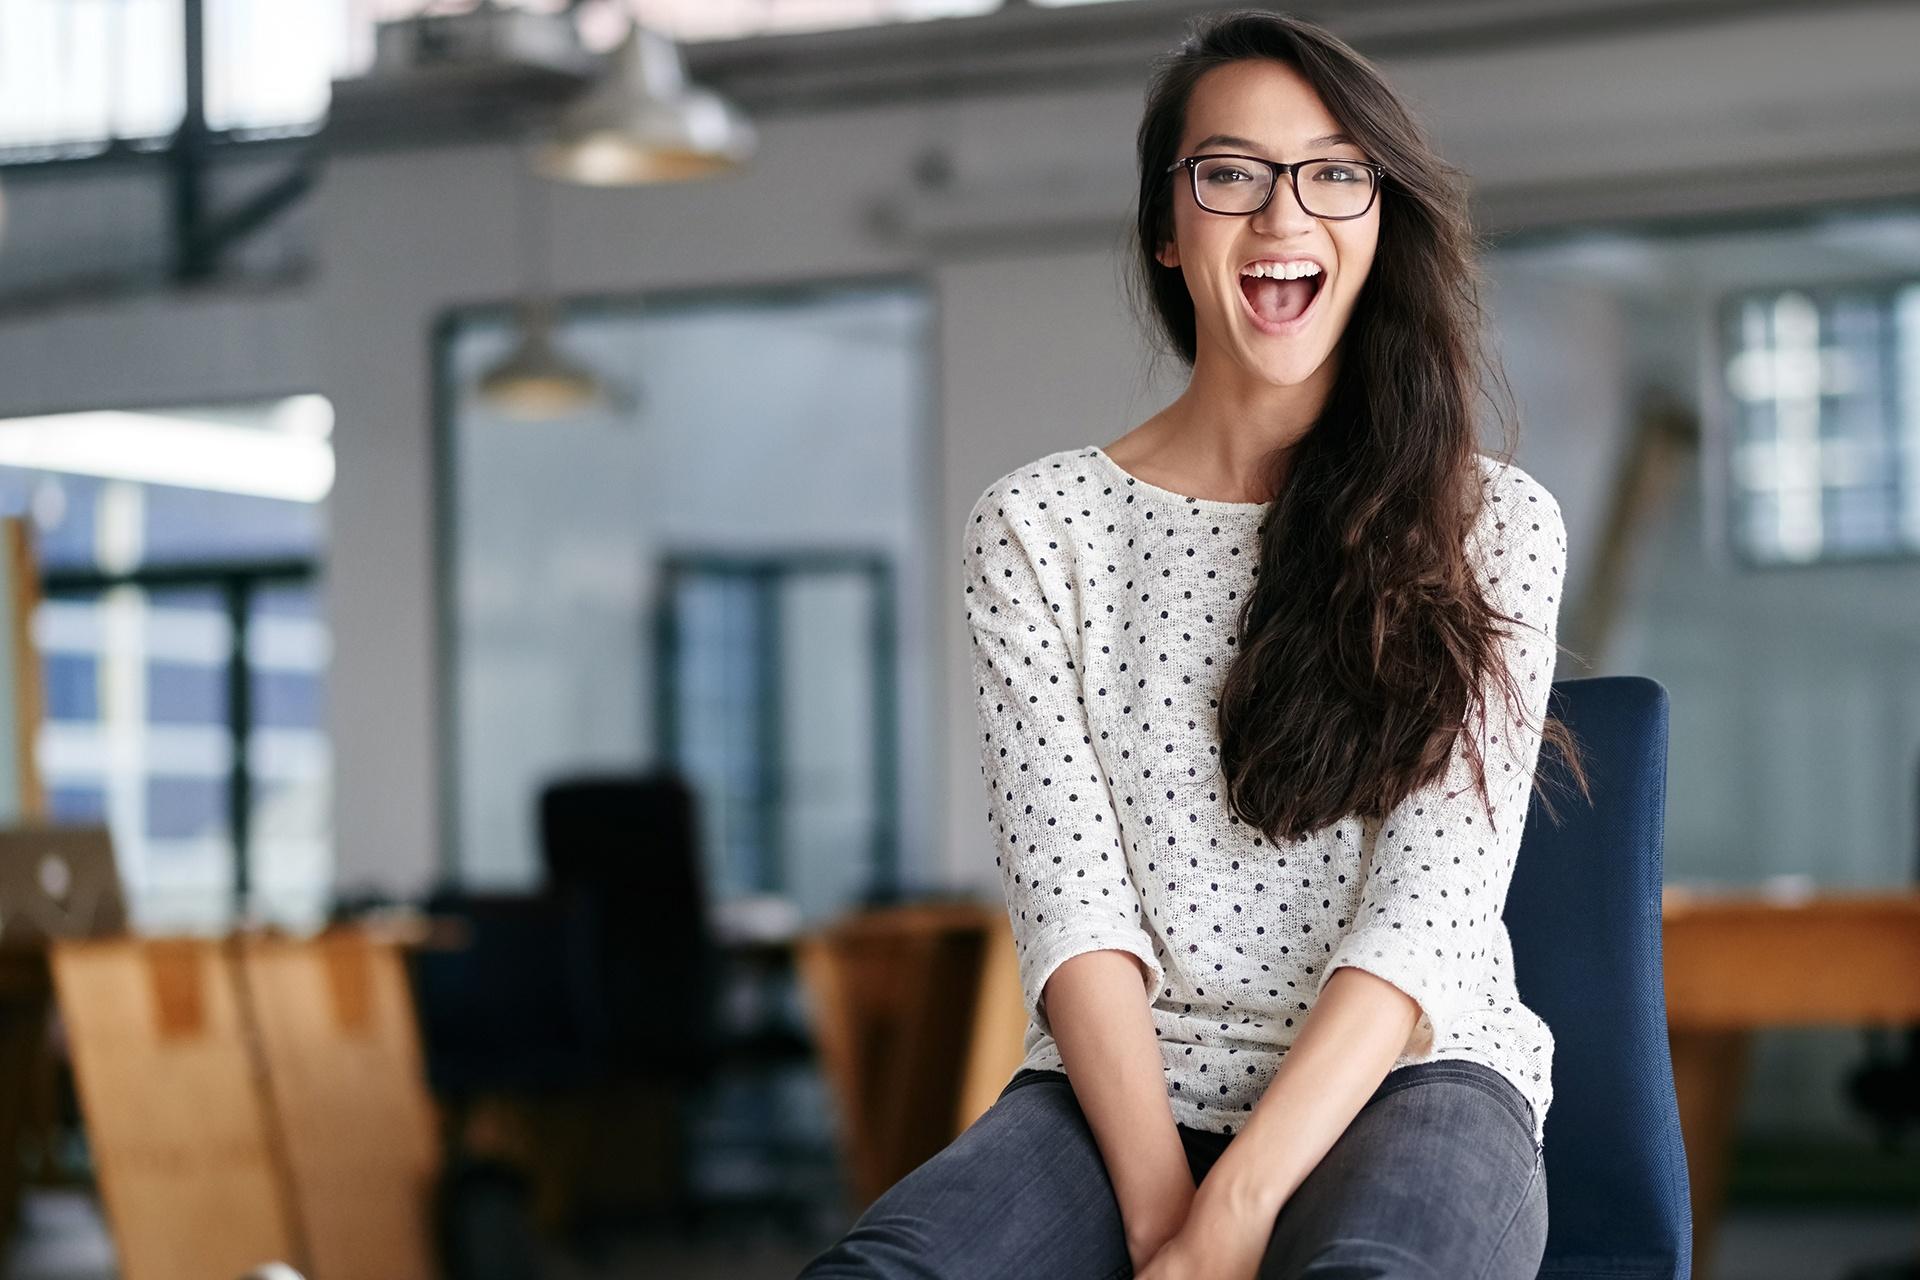 Stock_People_Woman_Office_Chair_Website_LandingPage_1920x1280.jpg